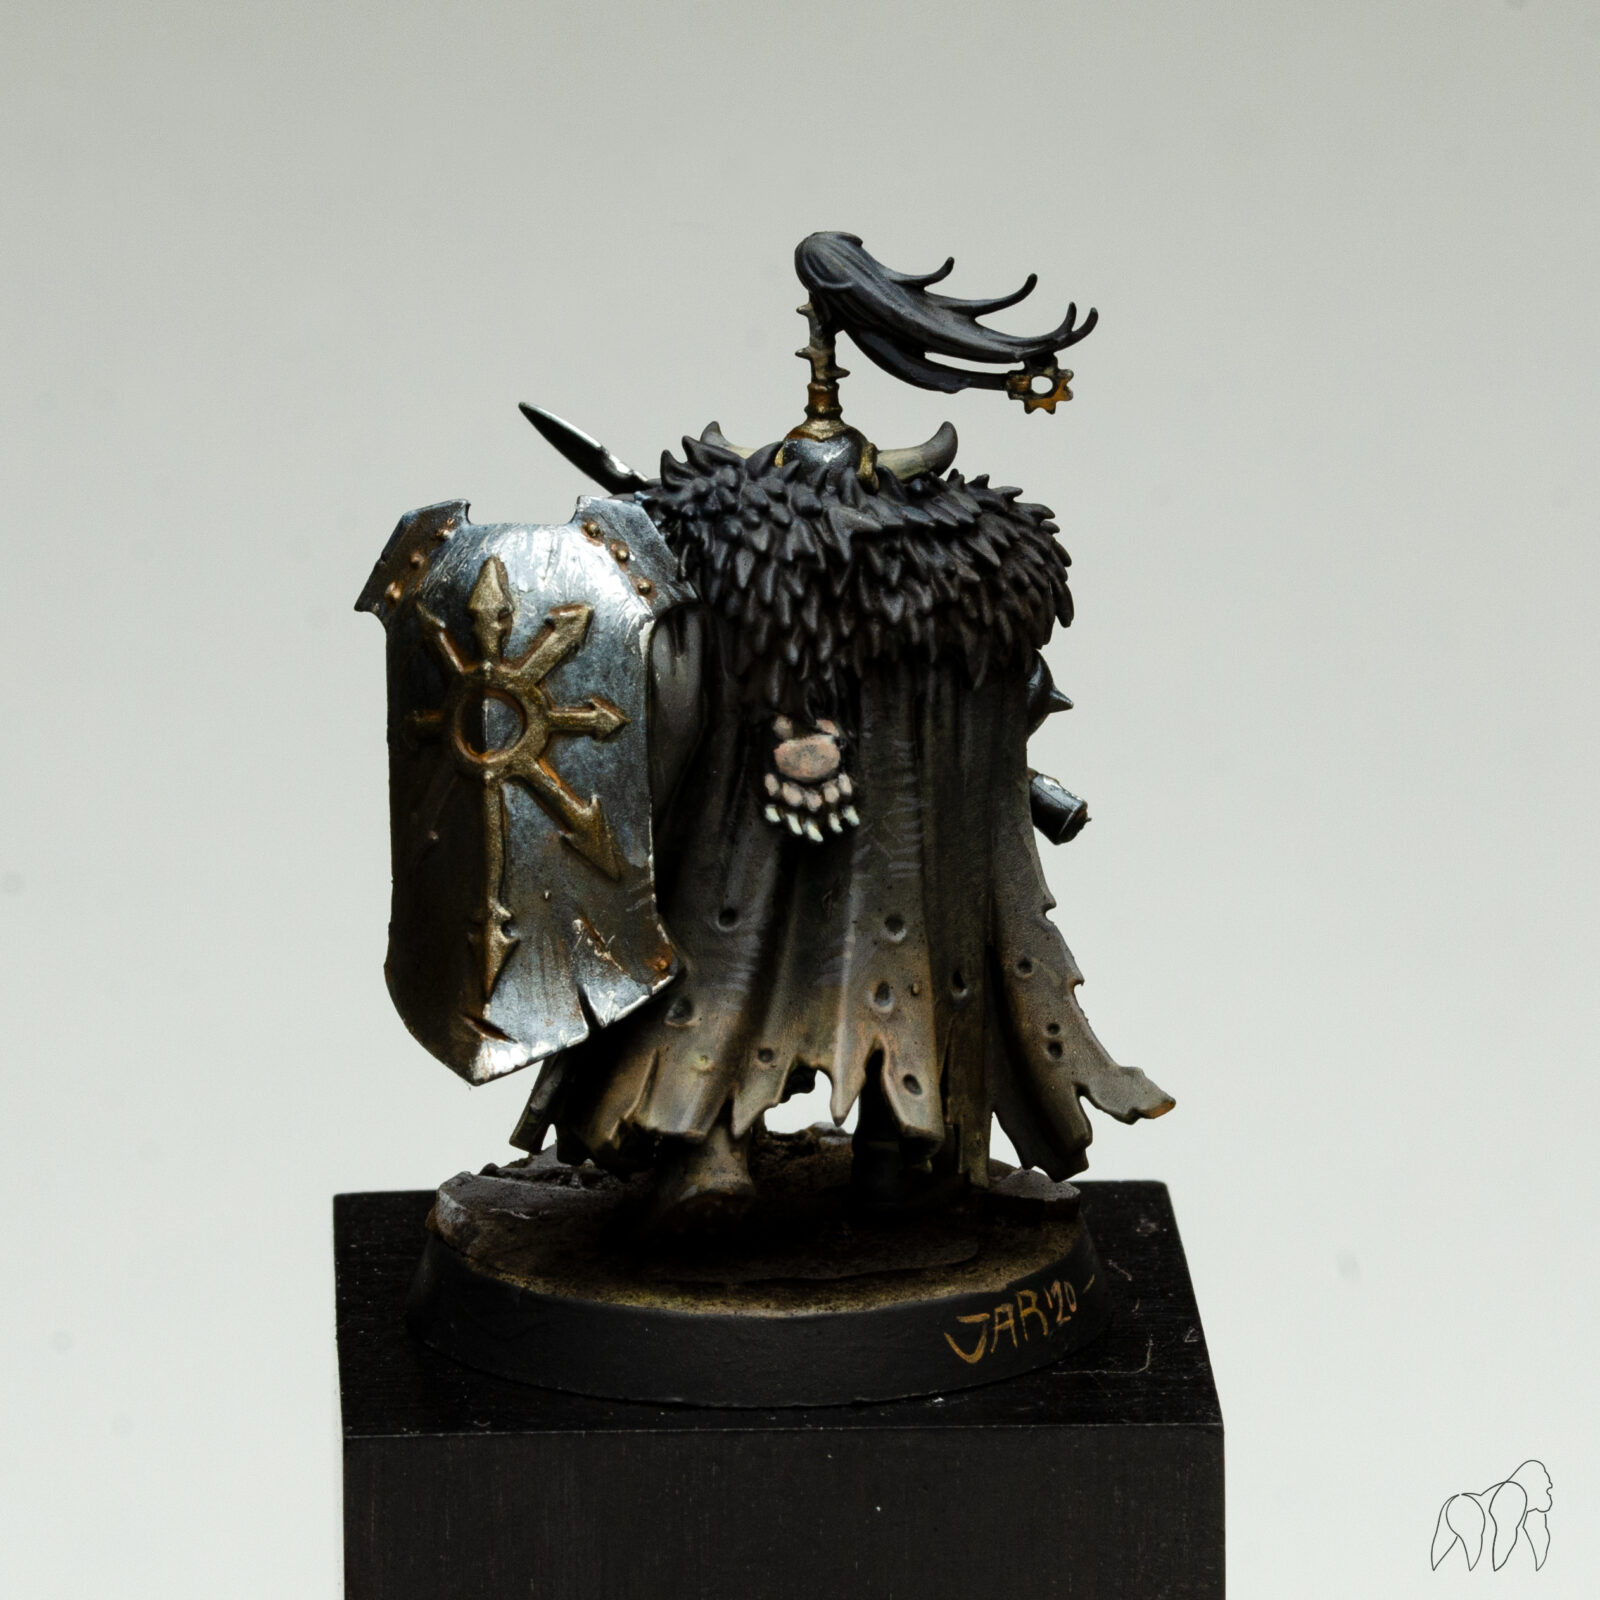 Chaoswarrior09